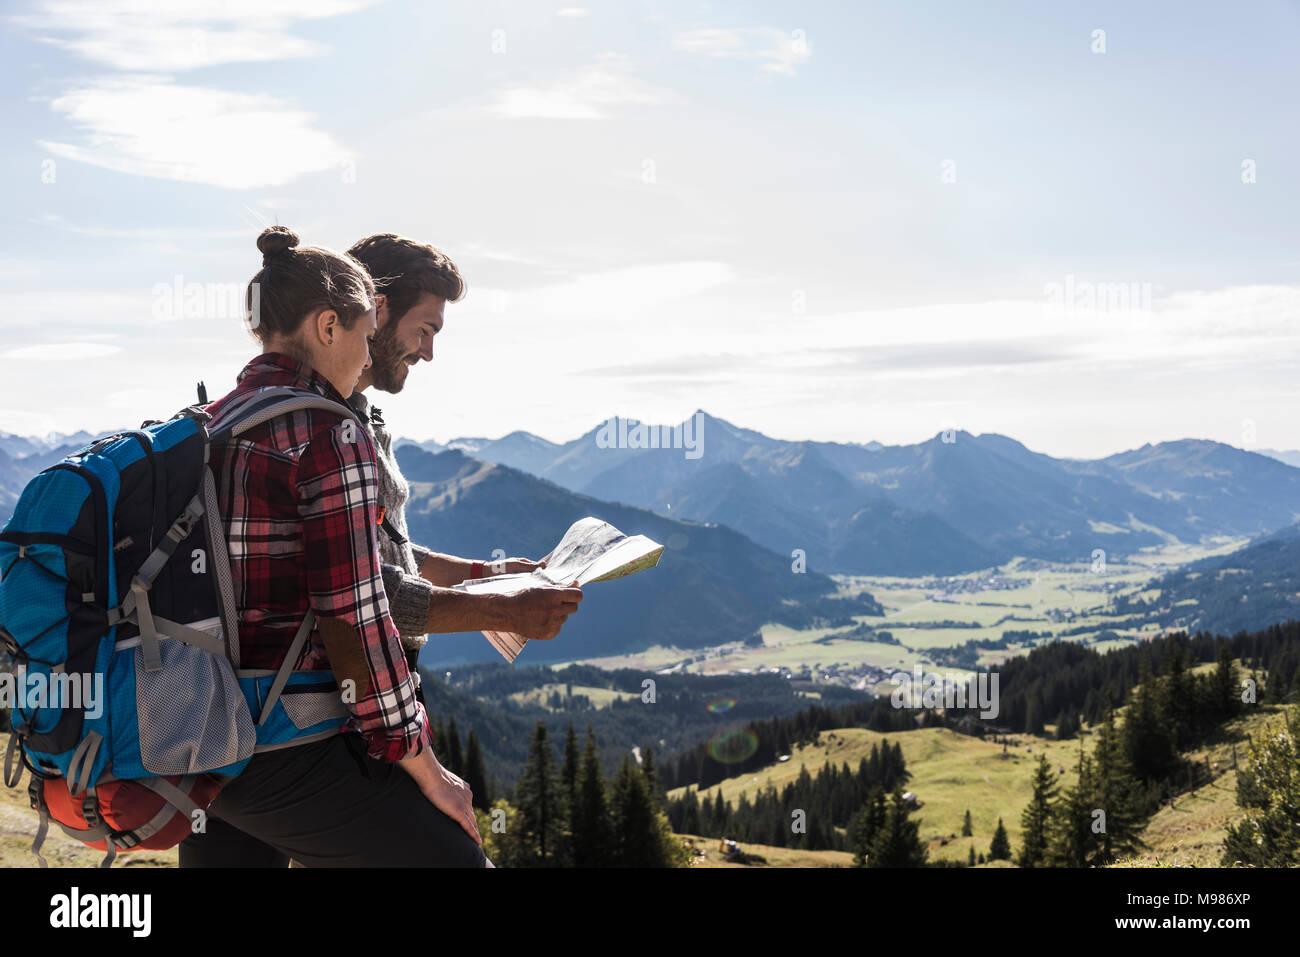 Österreich, Tirol, junges Paar an Karte suchen In Bergwelt Stockbild